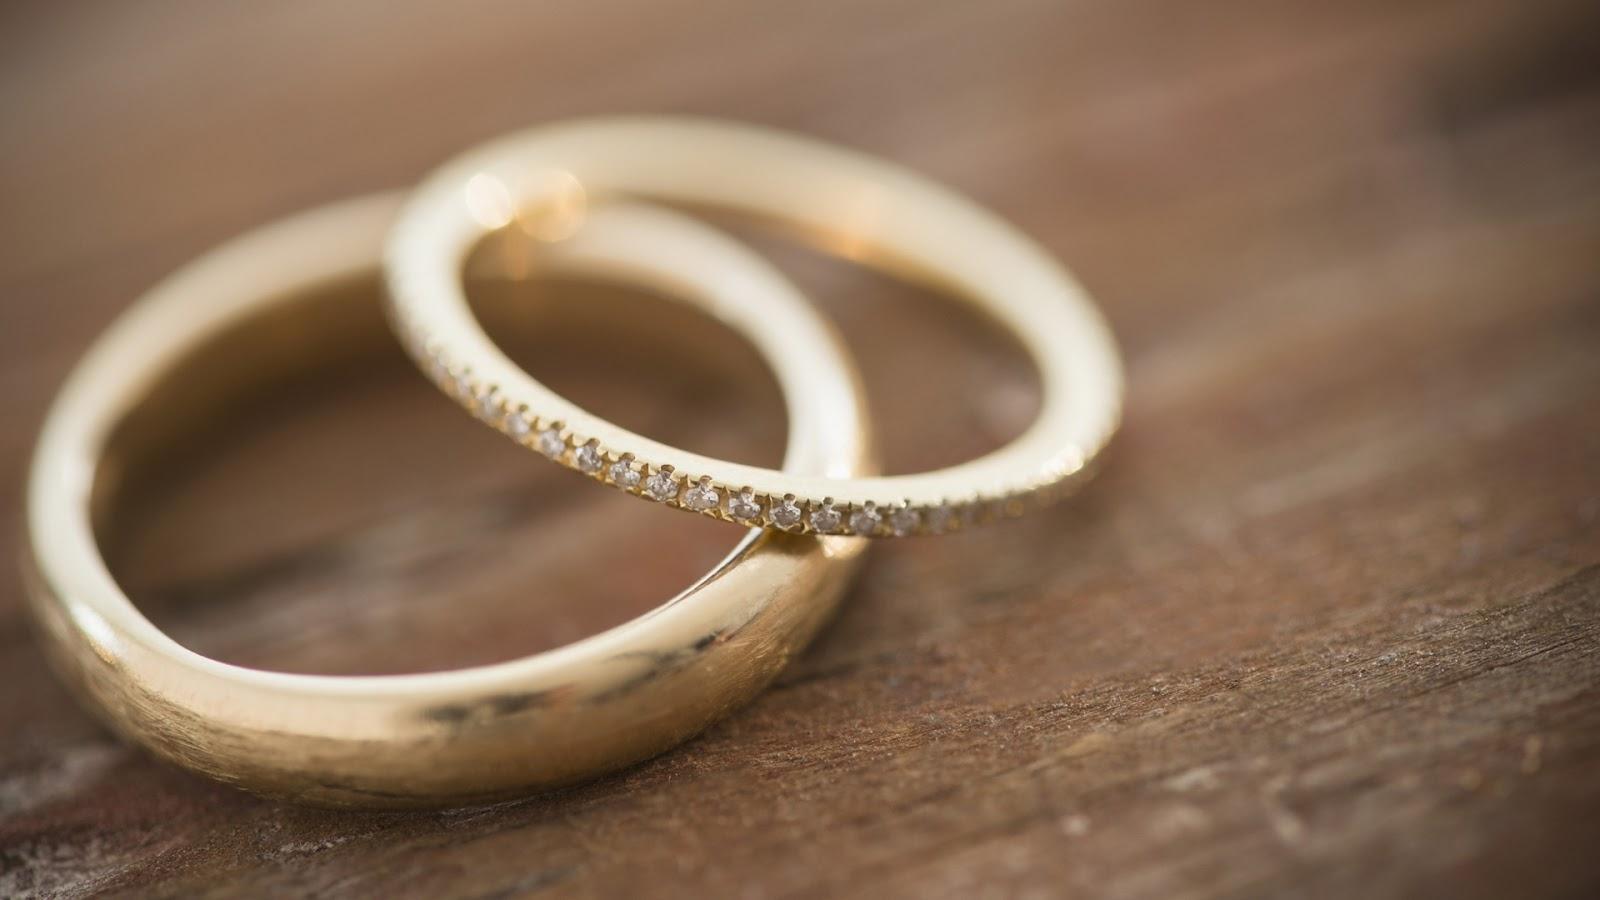 Jangan minta dinikahi kalau belum Dewasa